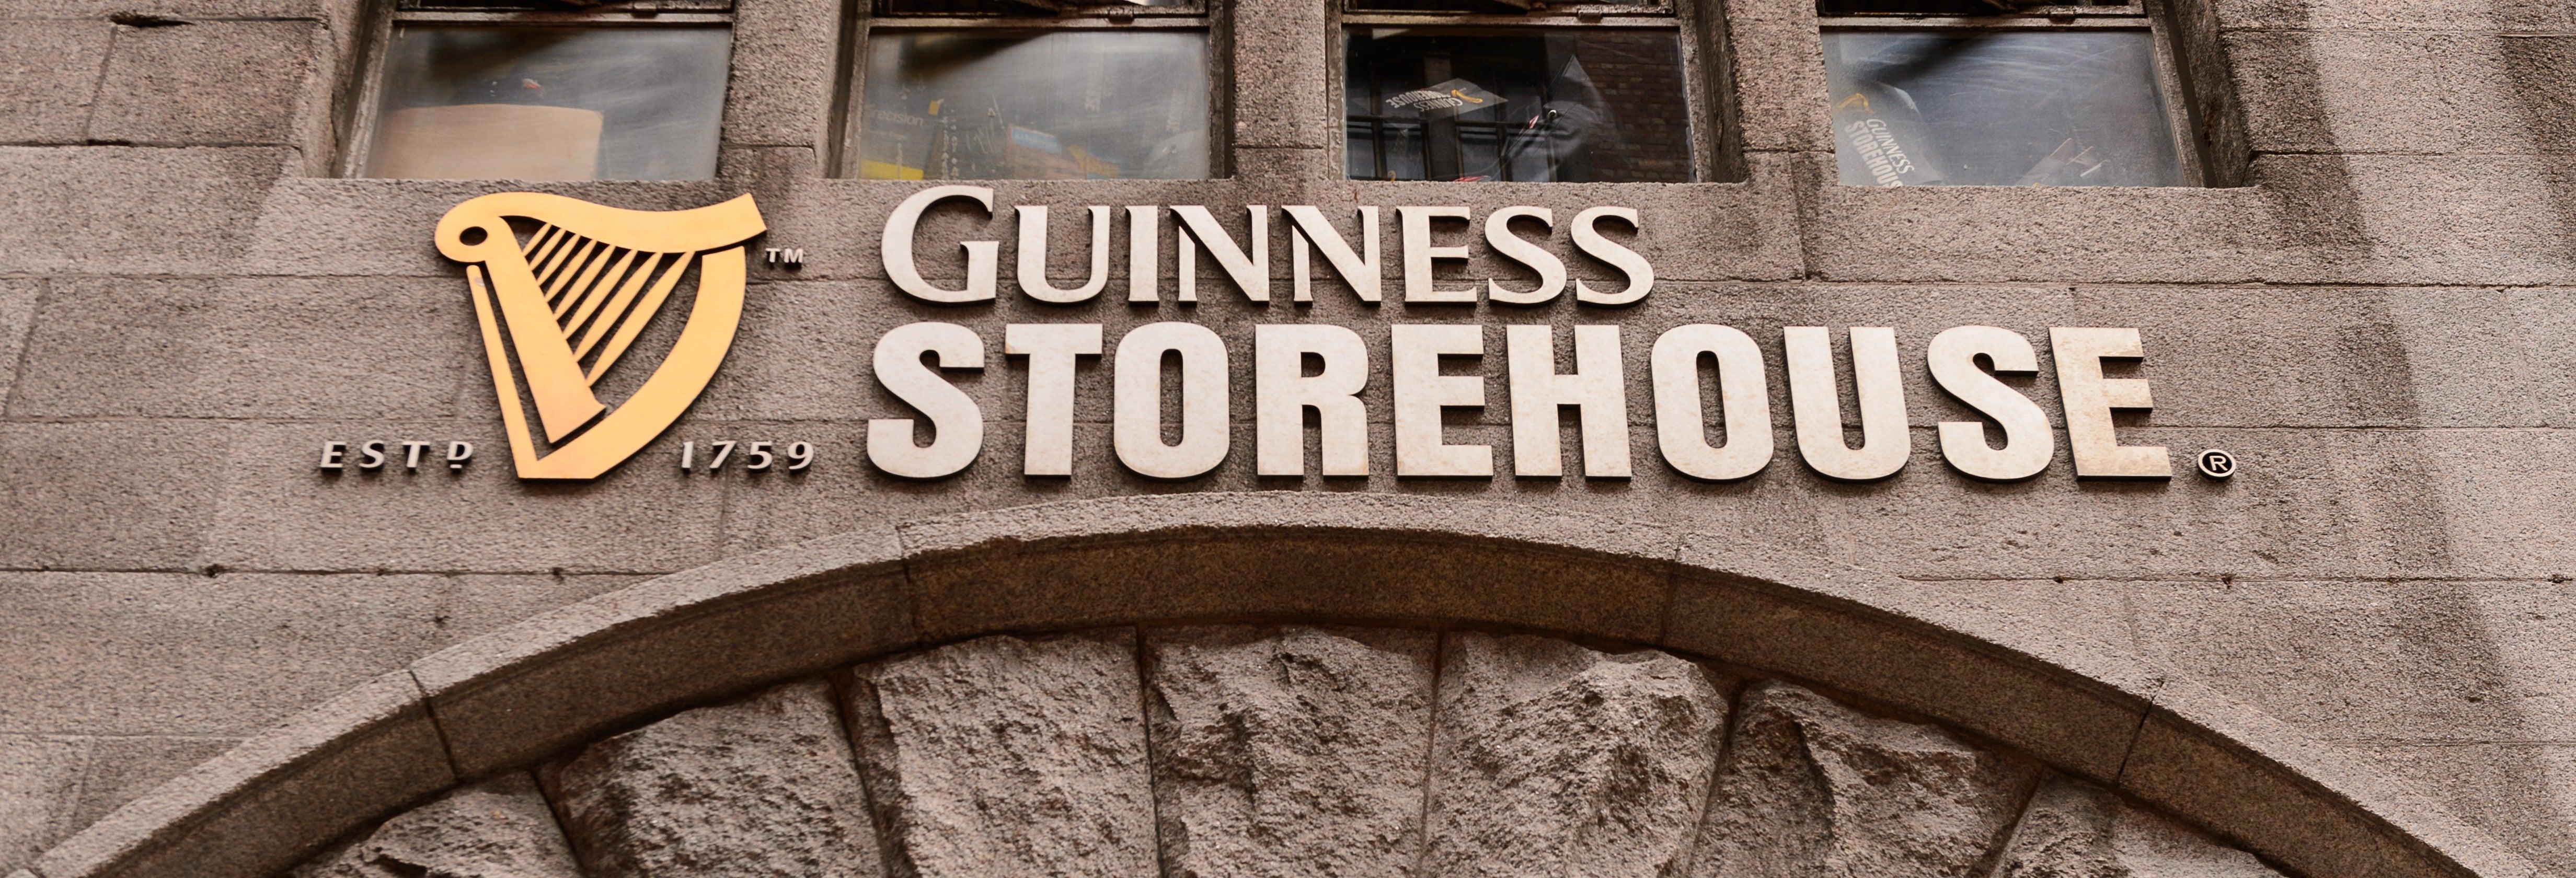 Visita guiada por la Guinness Storehouse